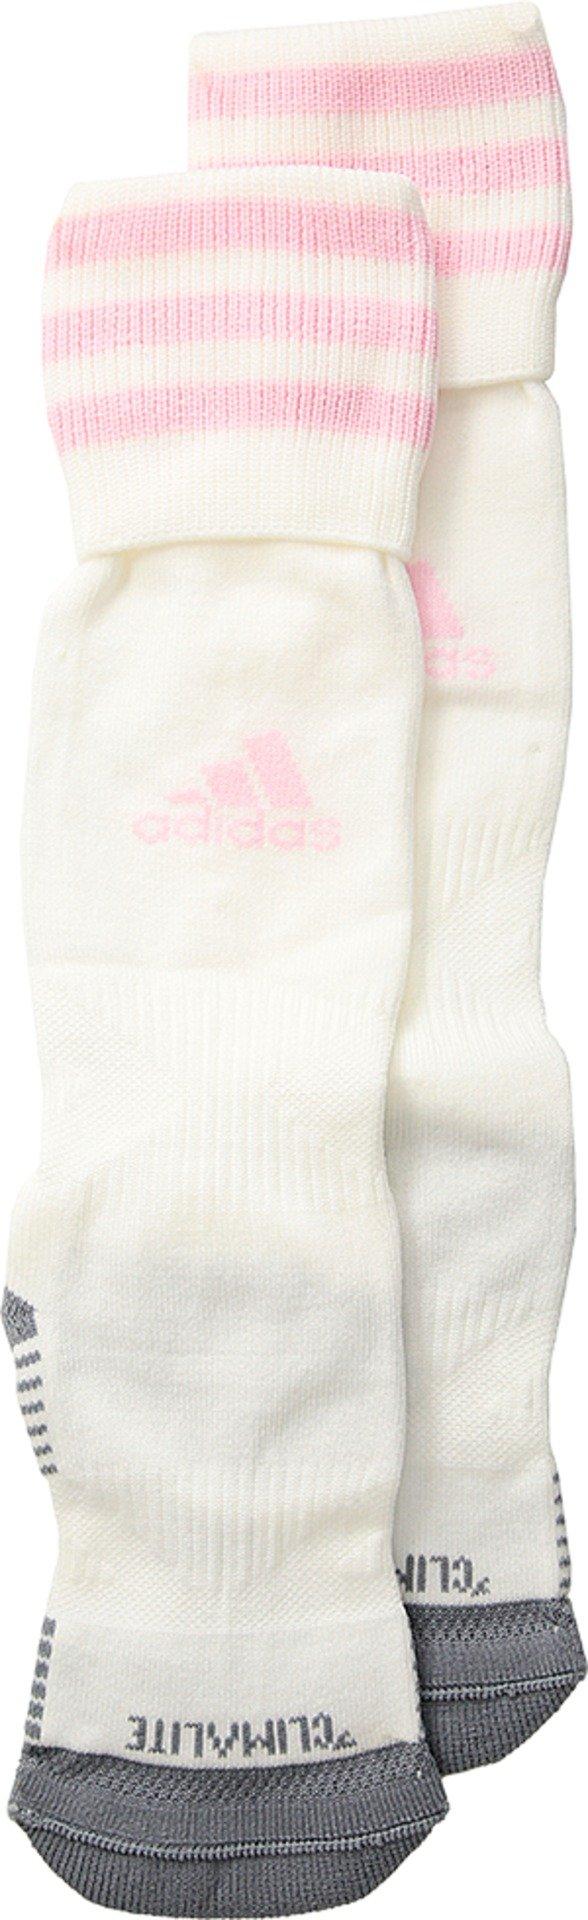 adidas Kids Unisex Copa Zone Cushion III OTC Sock (Toddler/Little Kids/Big Kids) White/Diva X-Small